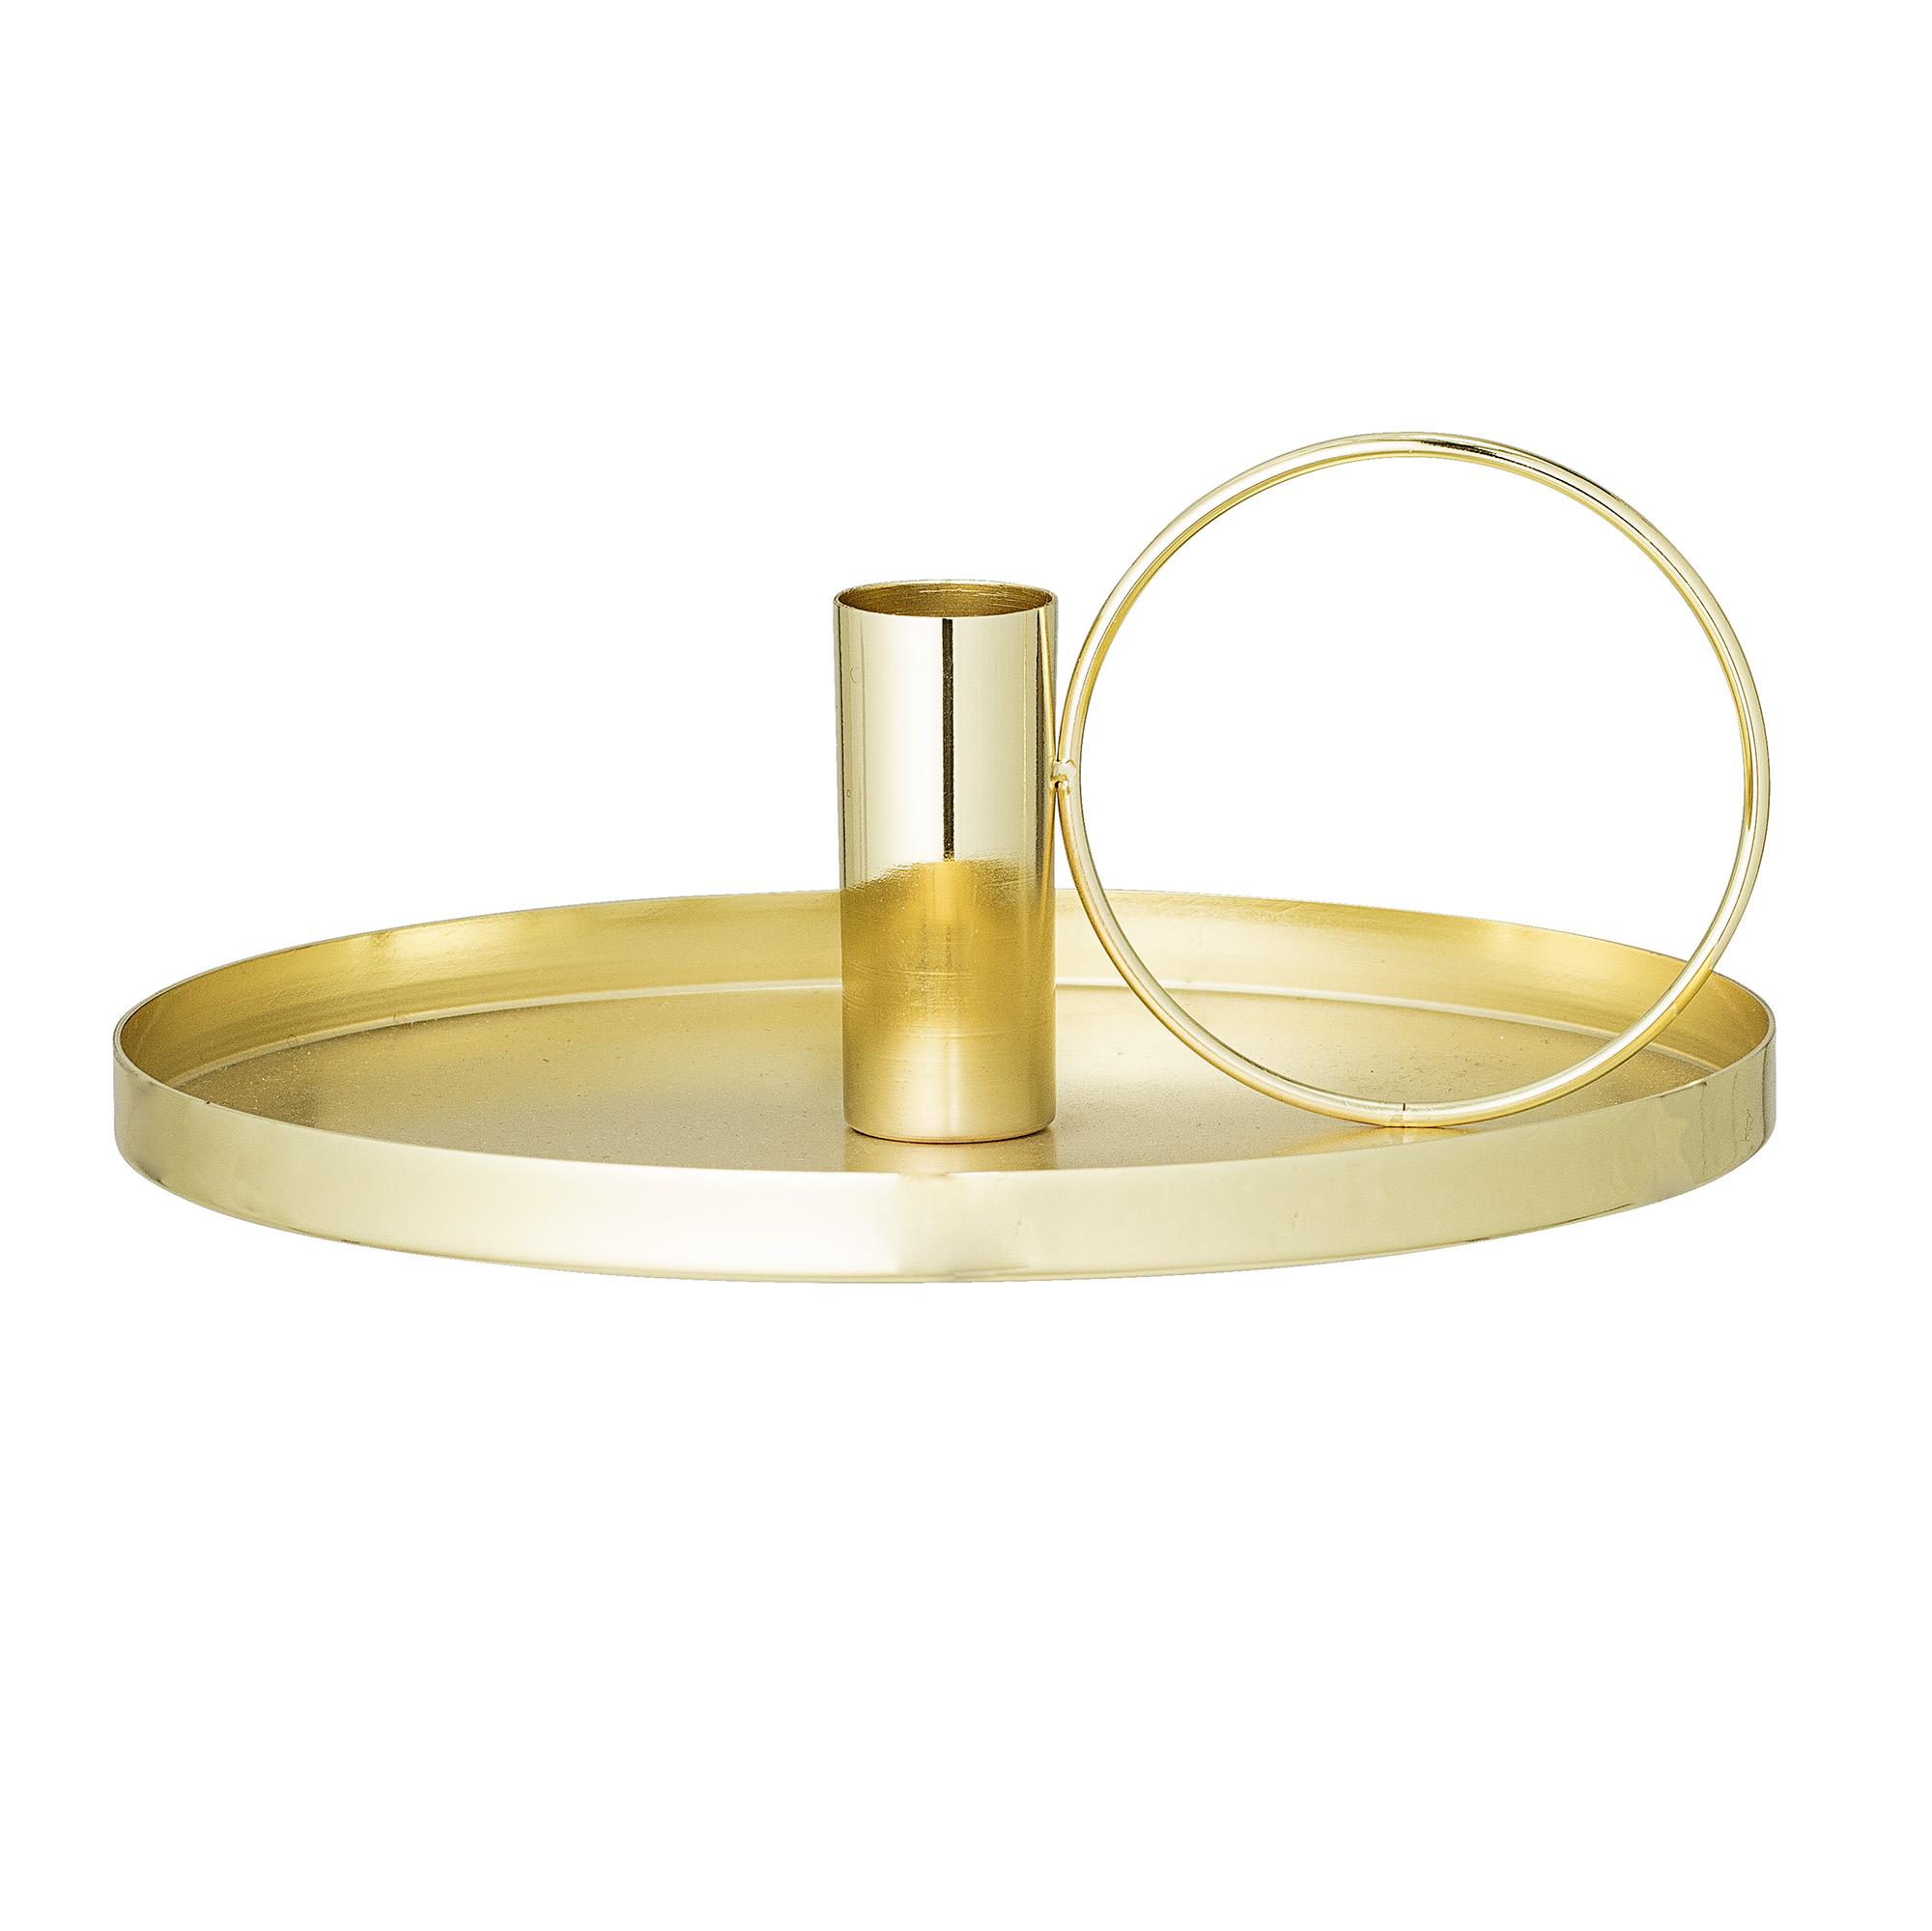 Suport lumanari Gold O19xH8 cm